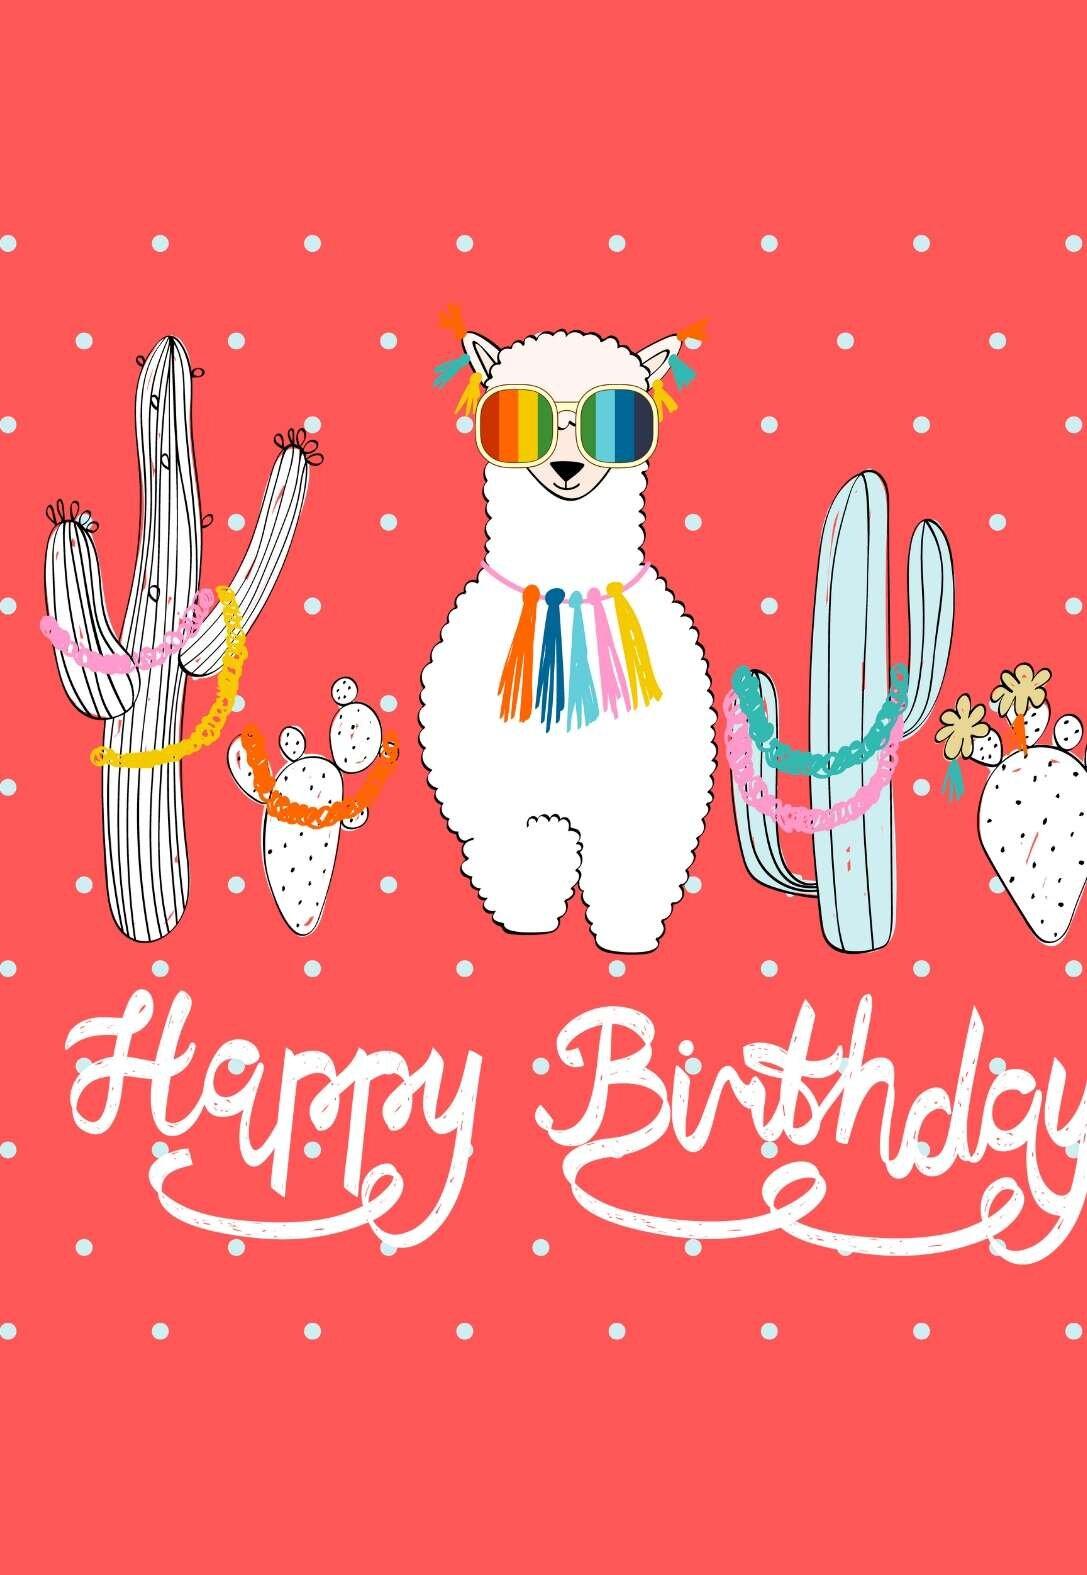 Llama Printable Birthday Cards Printbirthday Cards